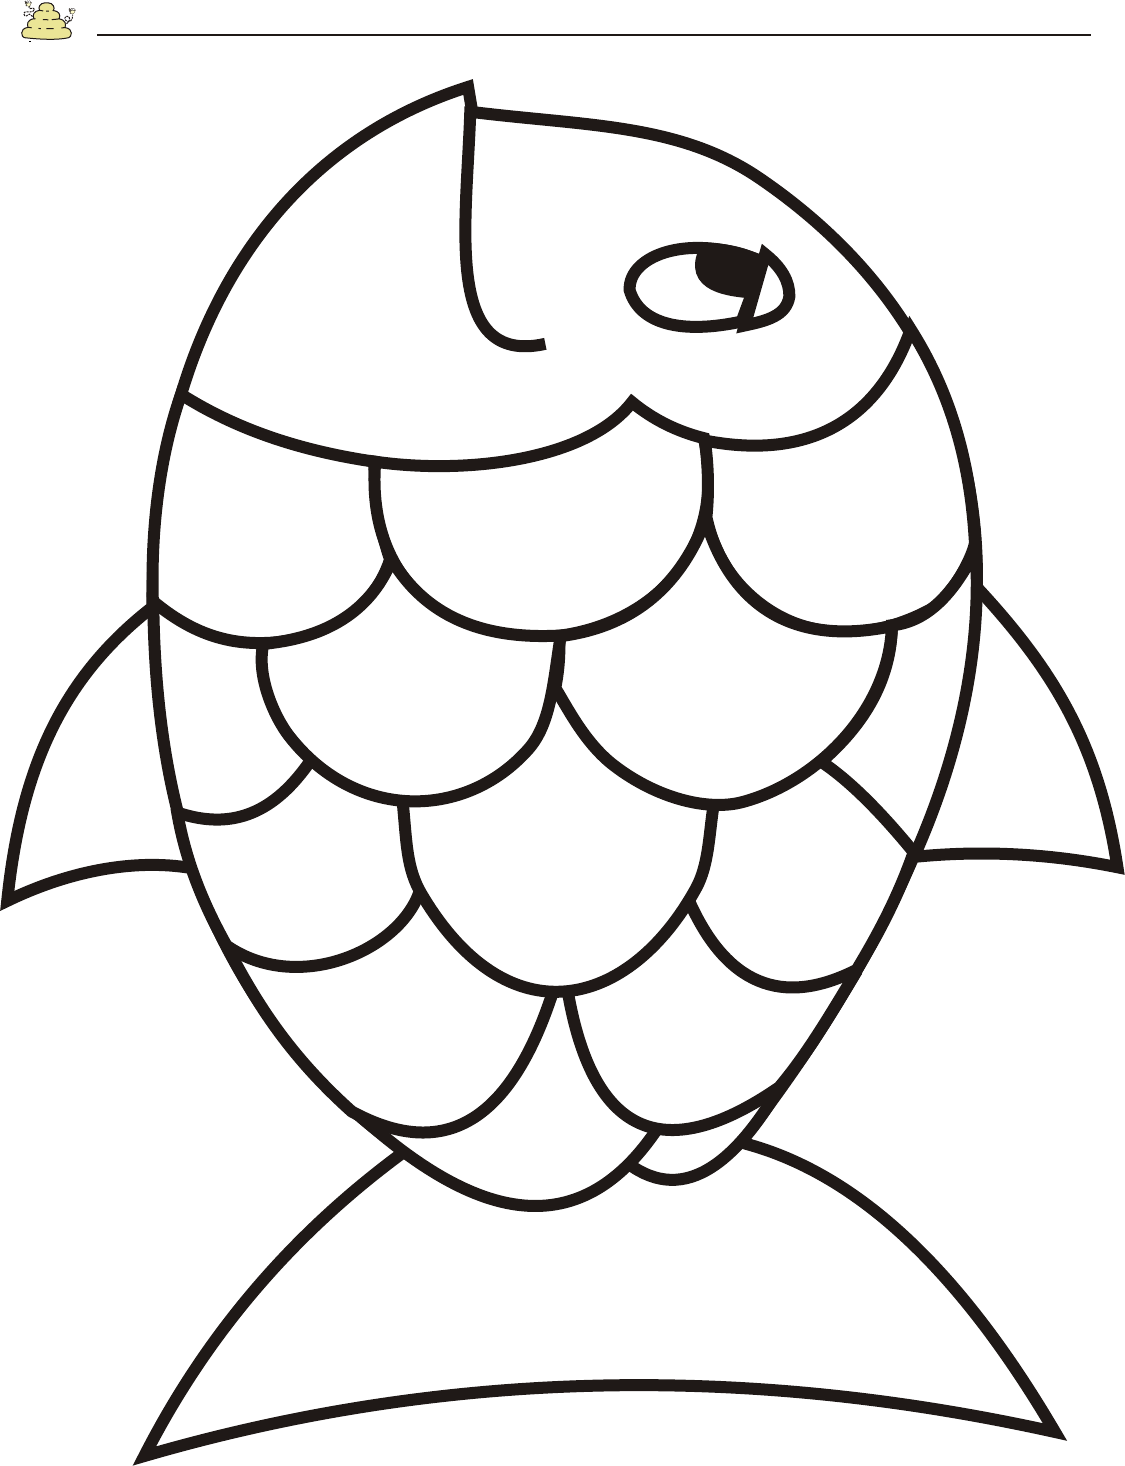 printable fish free rainbow fish template pdf 2 pages page 2 fish printable